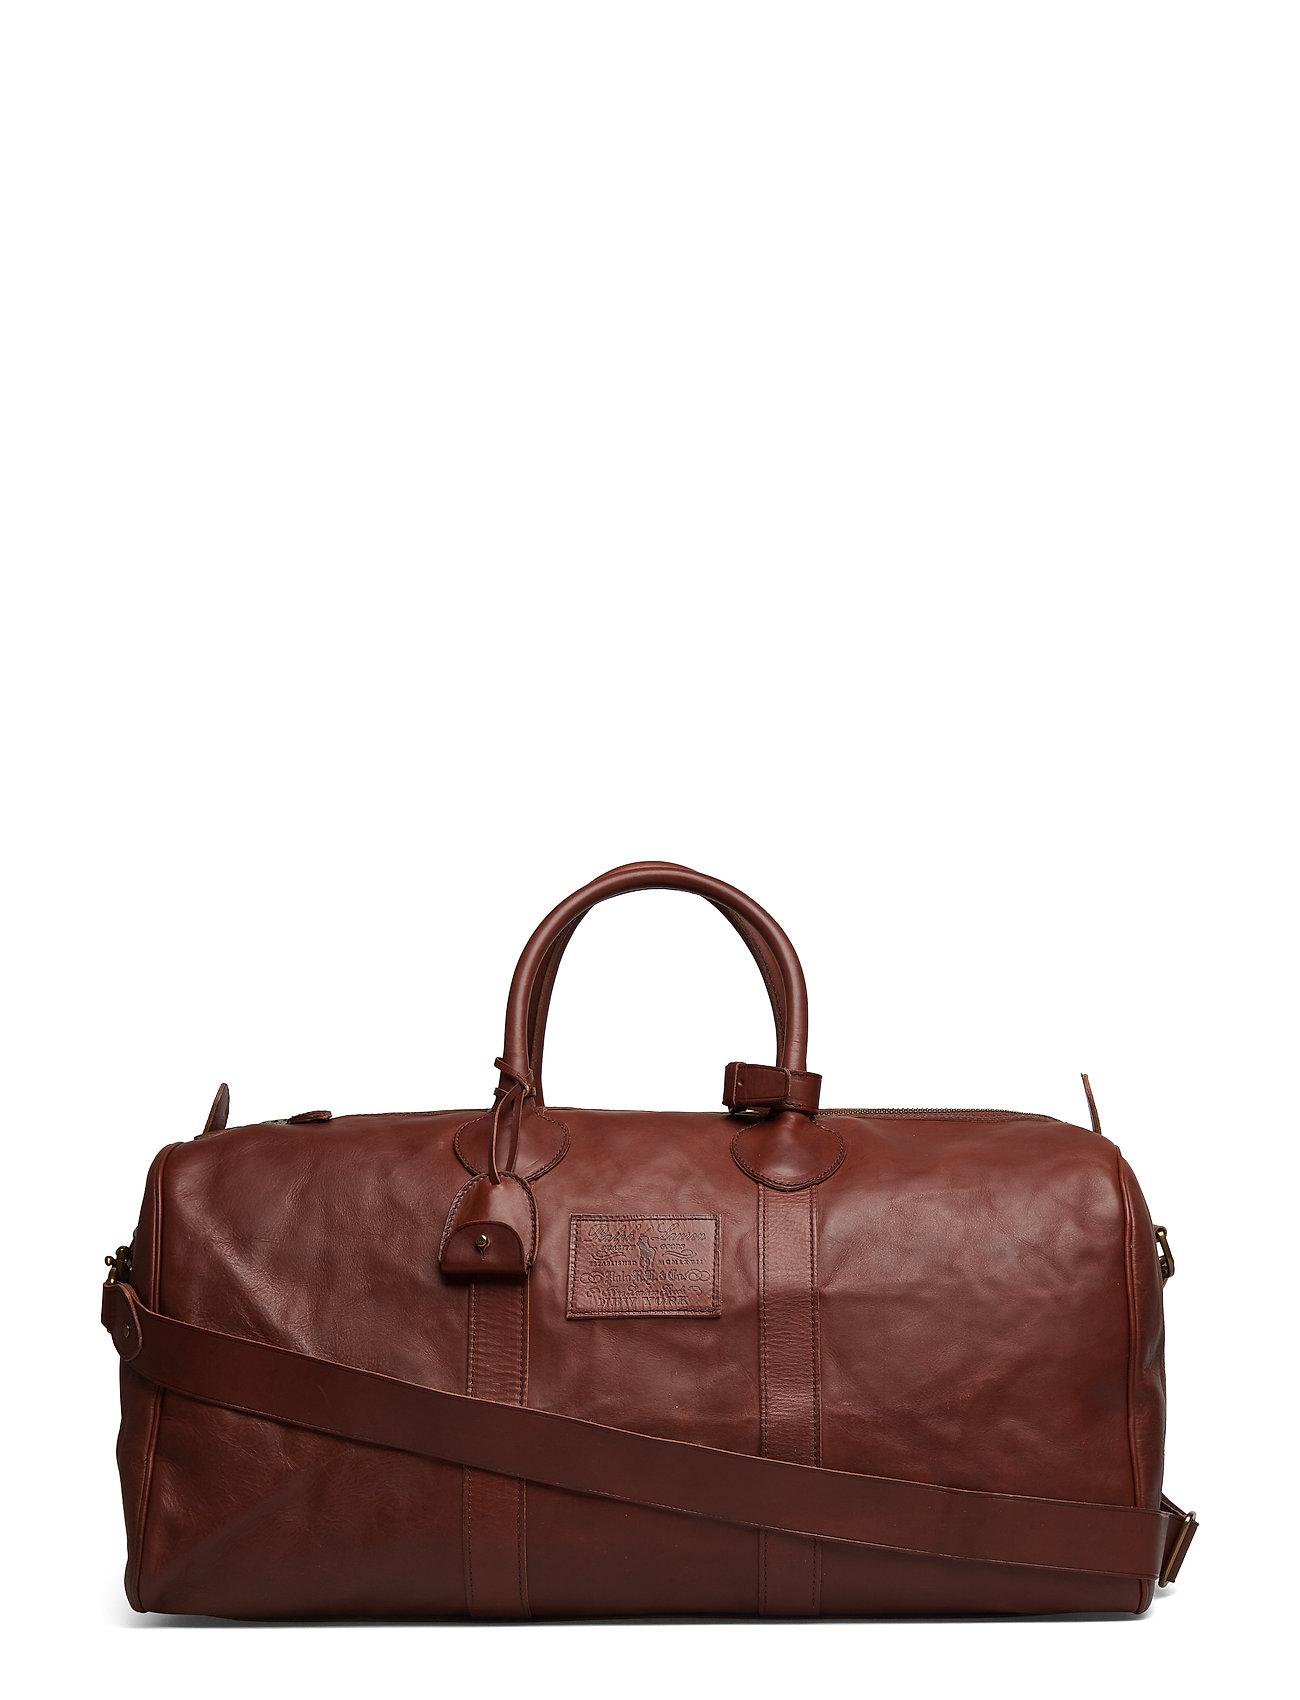 Polo Ralph Lauren Leather Proprietor Duffel